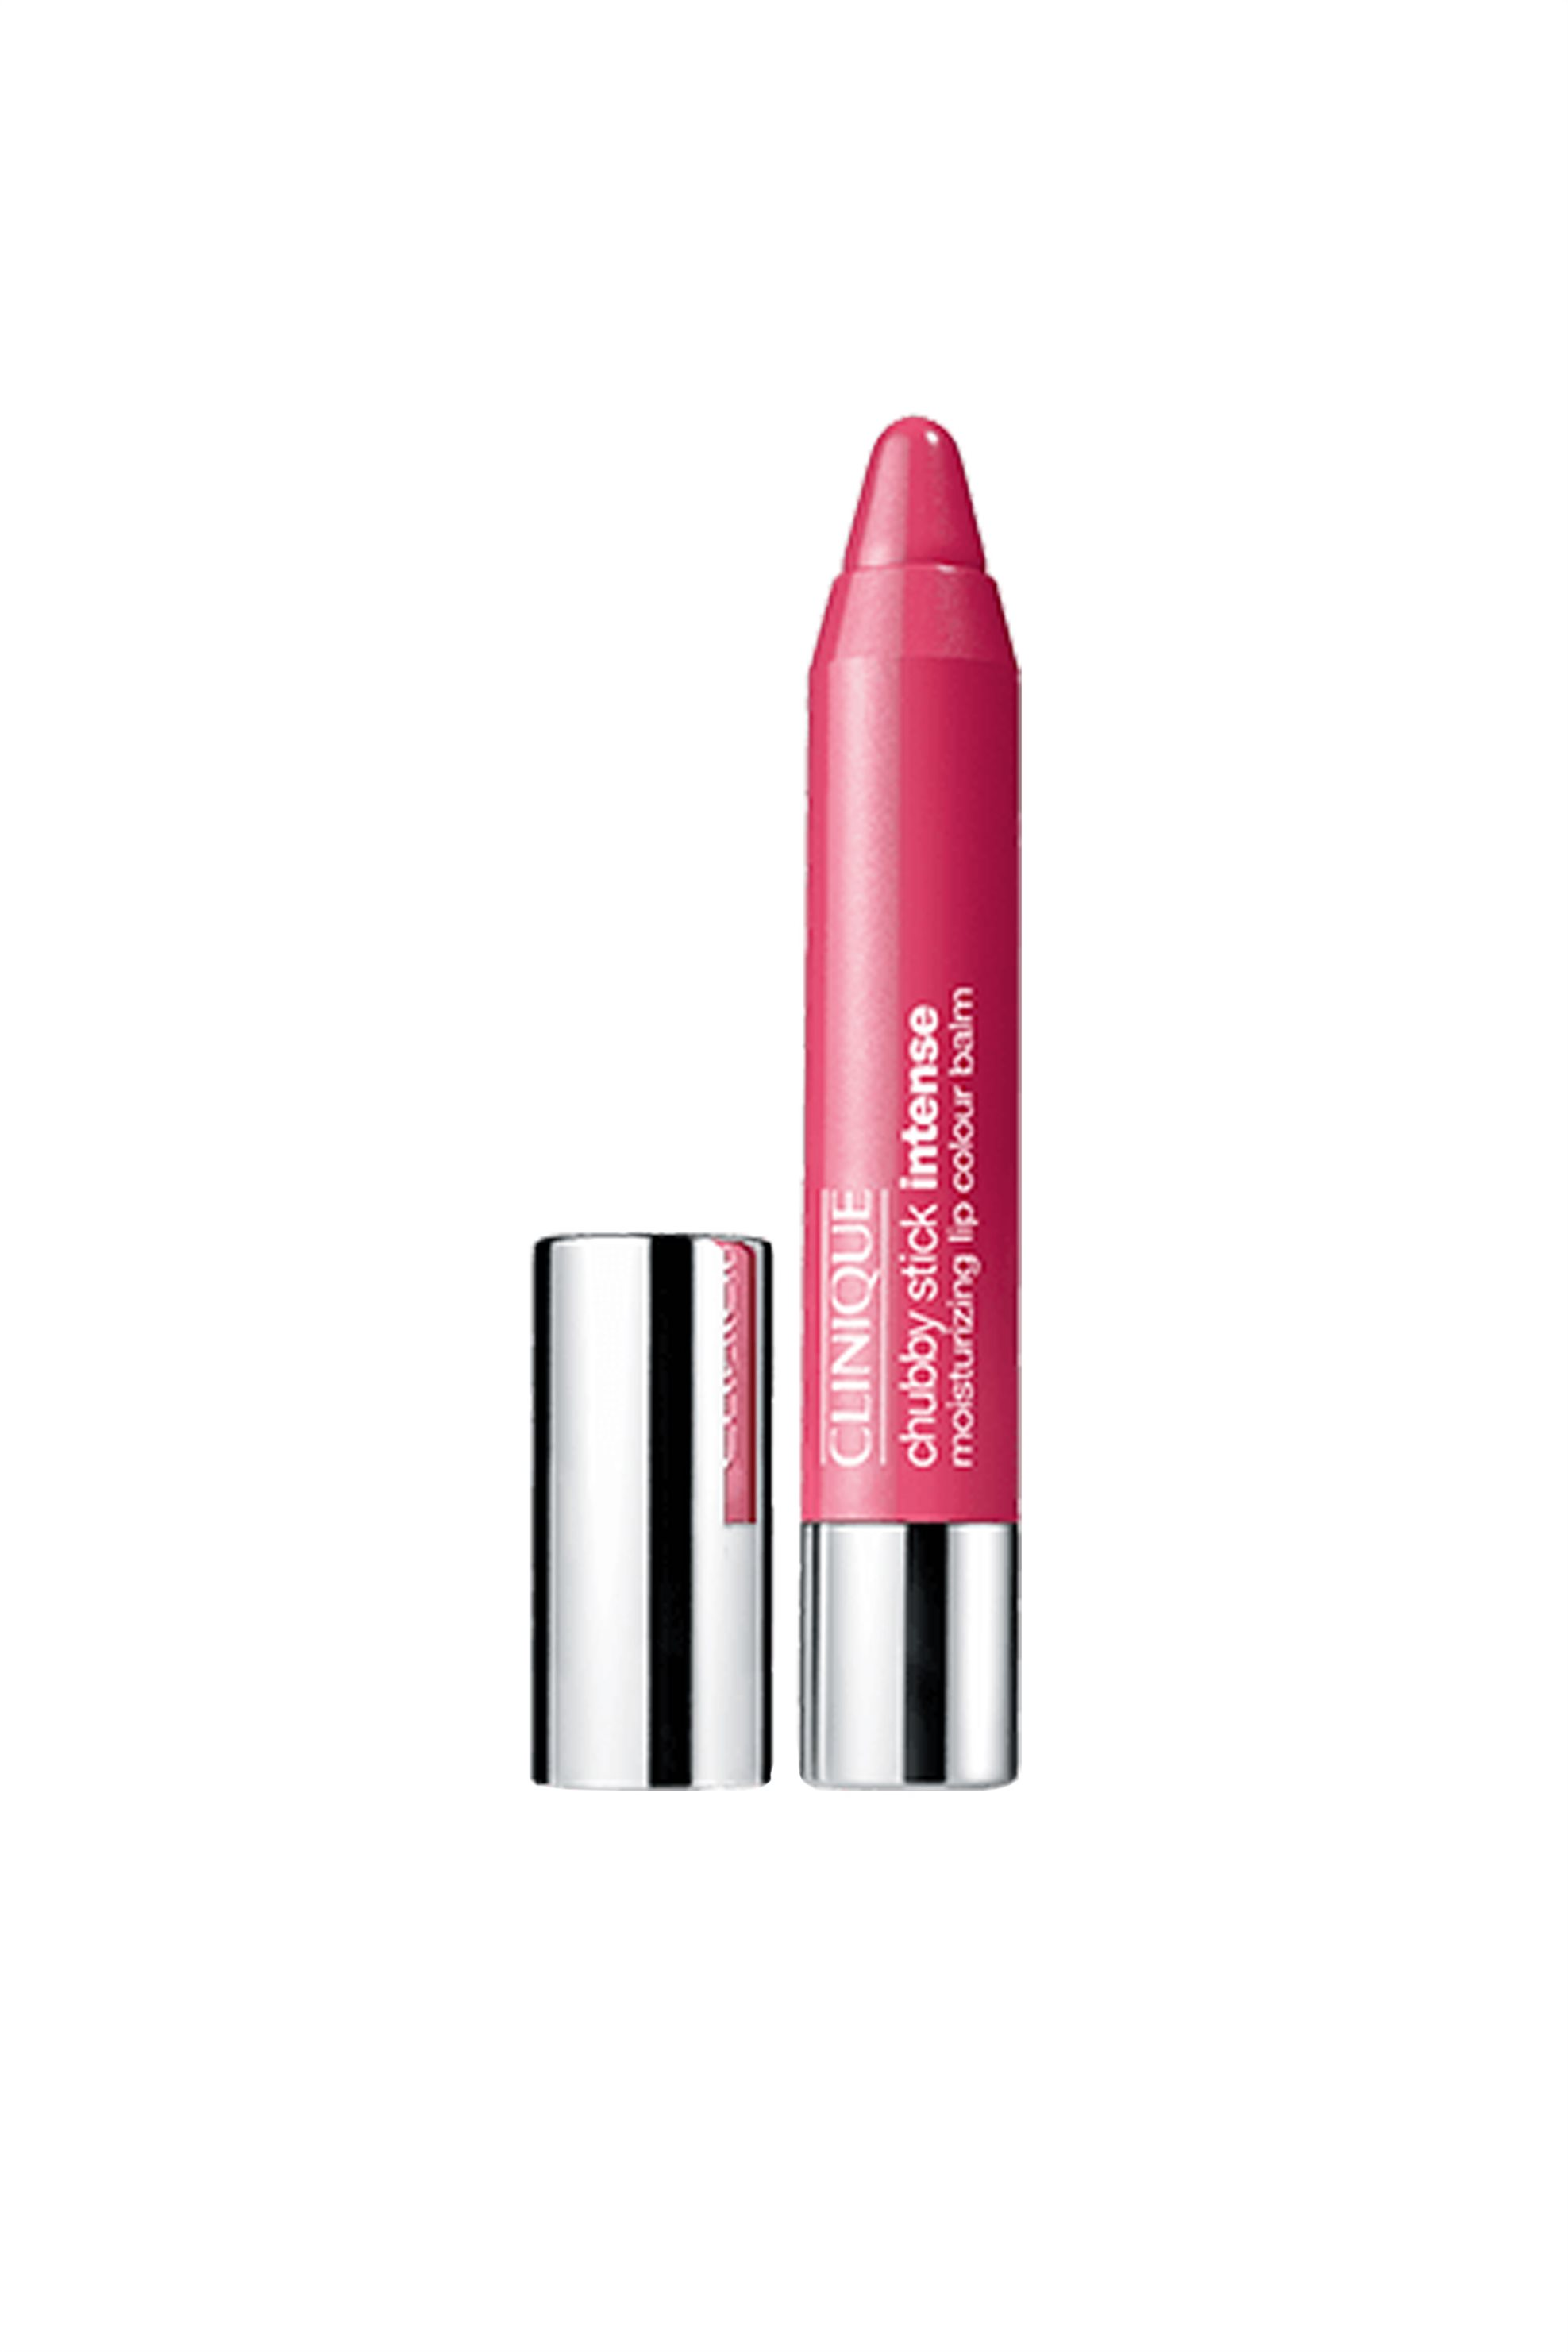 Clinique Chubby Stick Intense™ Moisturizing Lip Colour Balm 05 Plushest Punch 3  ομορφια   καλλυντικα επιλεκτικησ   μακιγιάζ   χείλη   lip gloss   balms